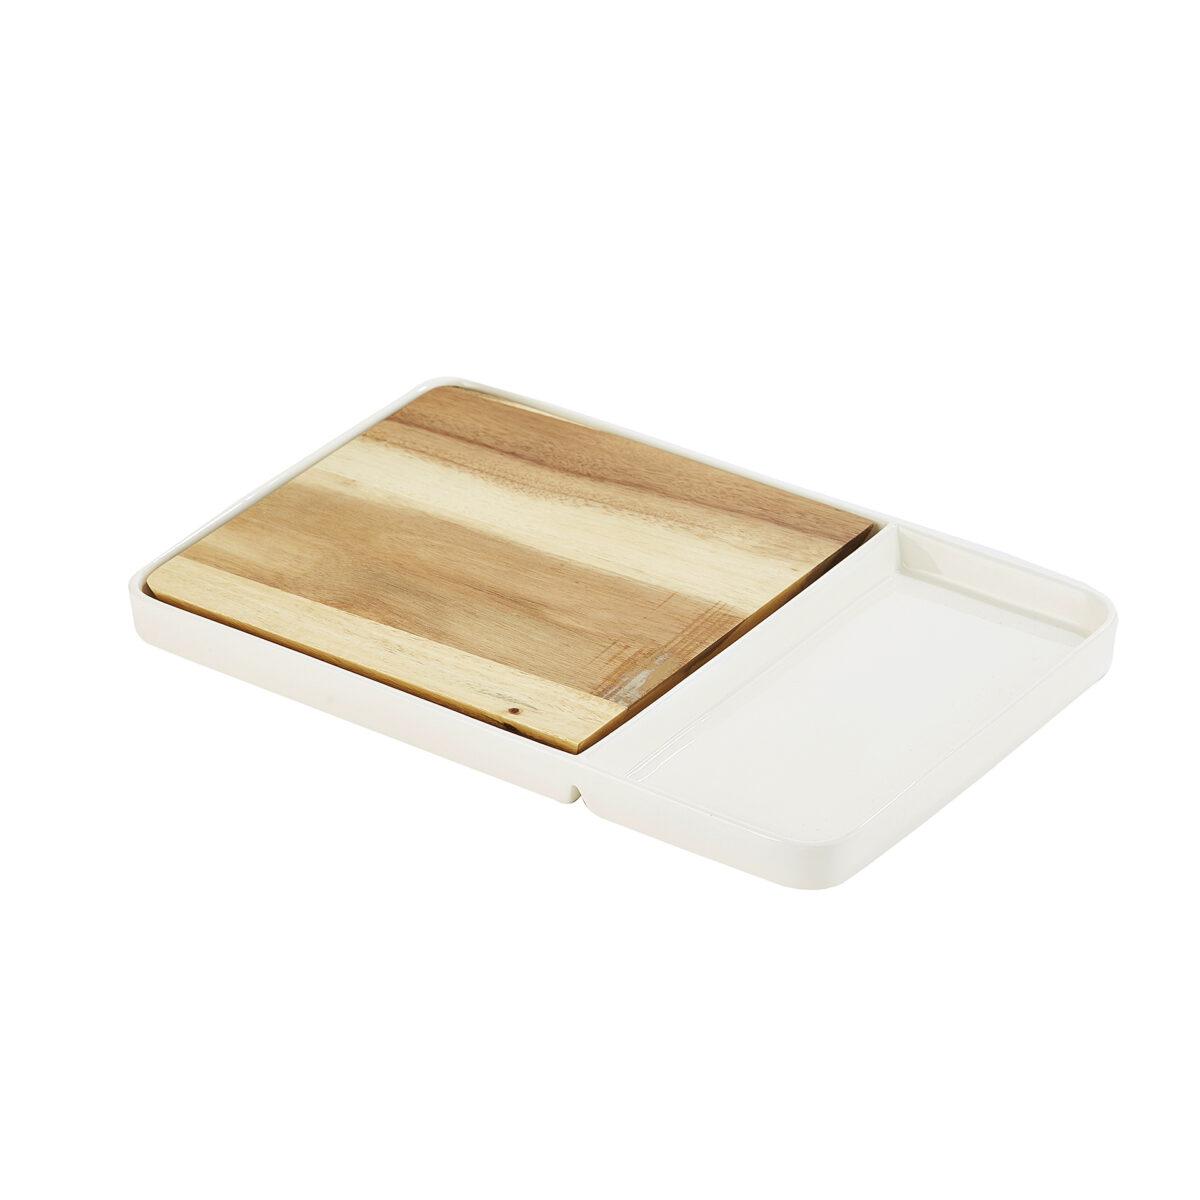 White Ceramic Serving Board 1